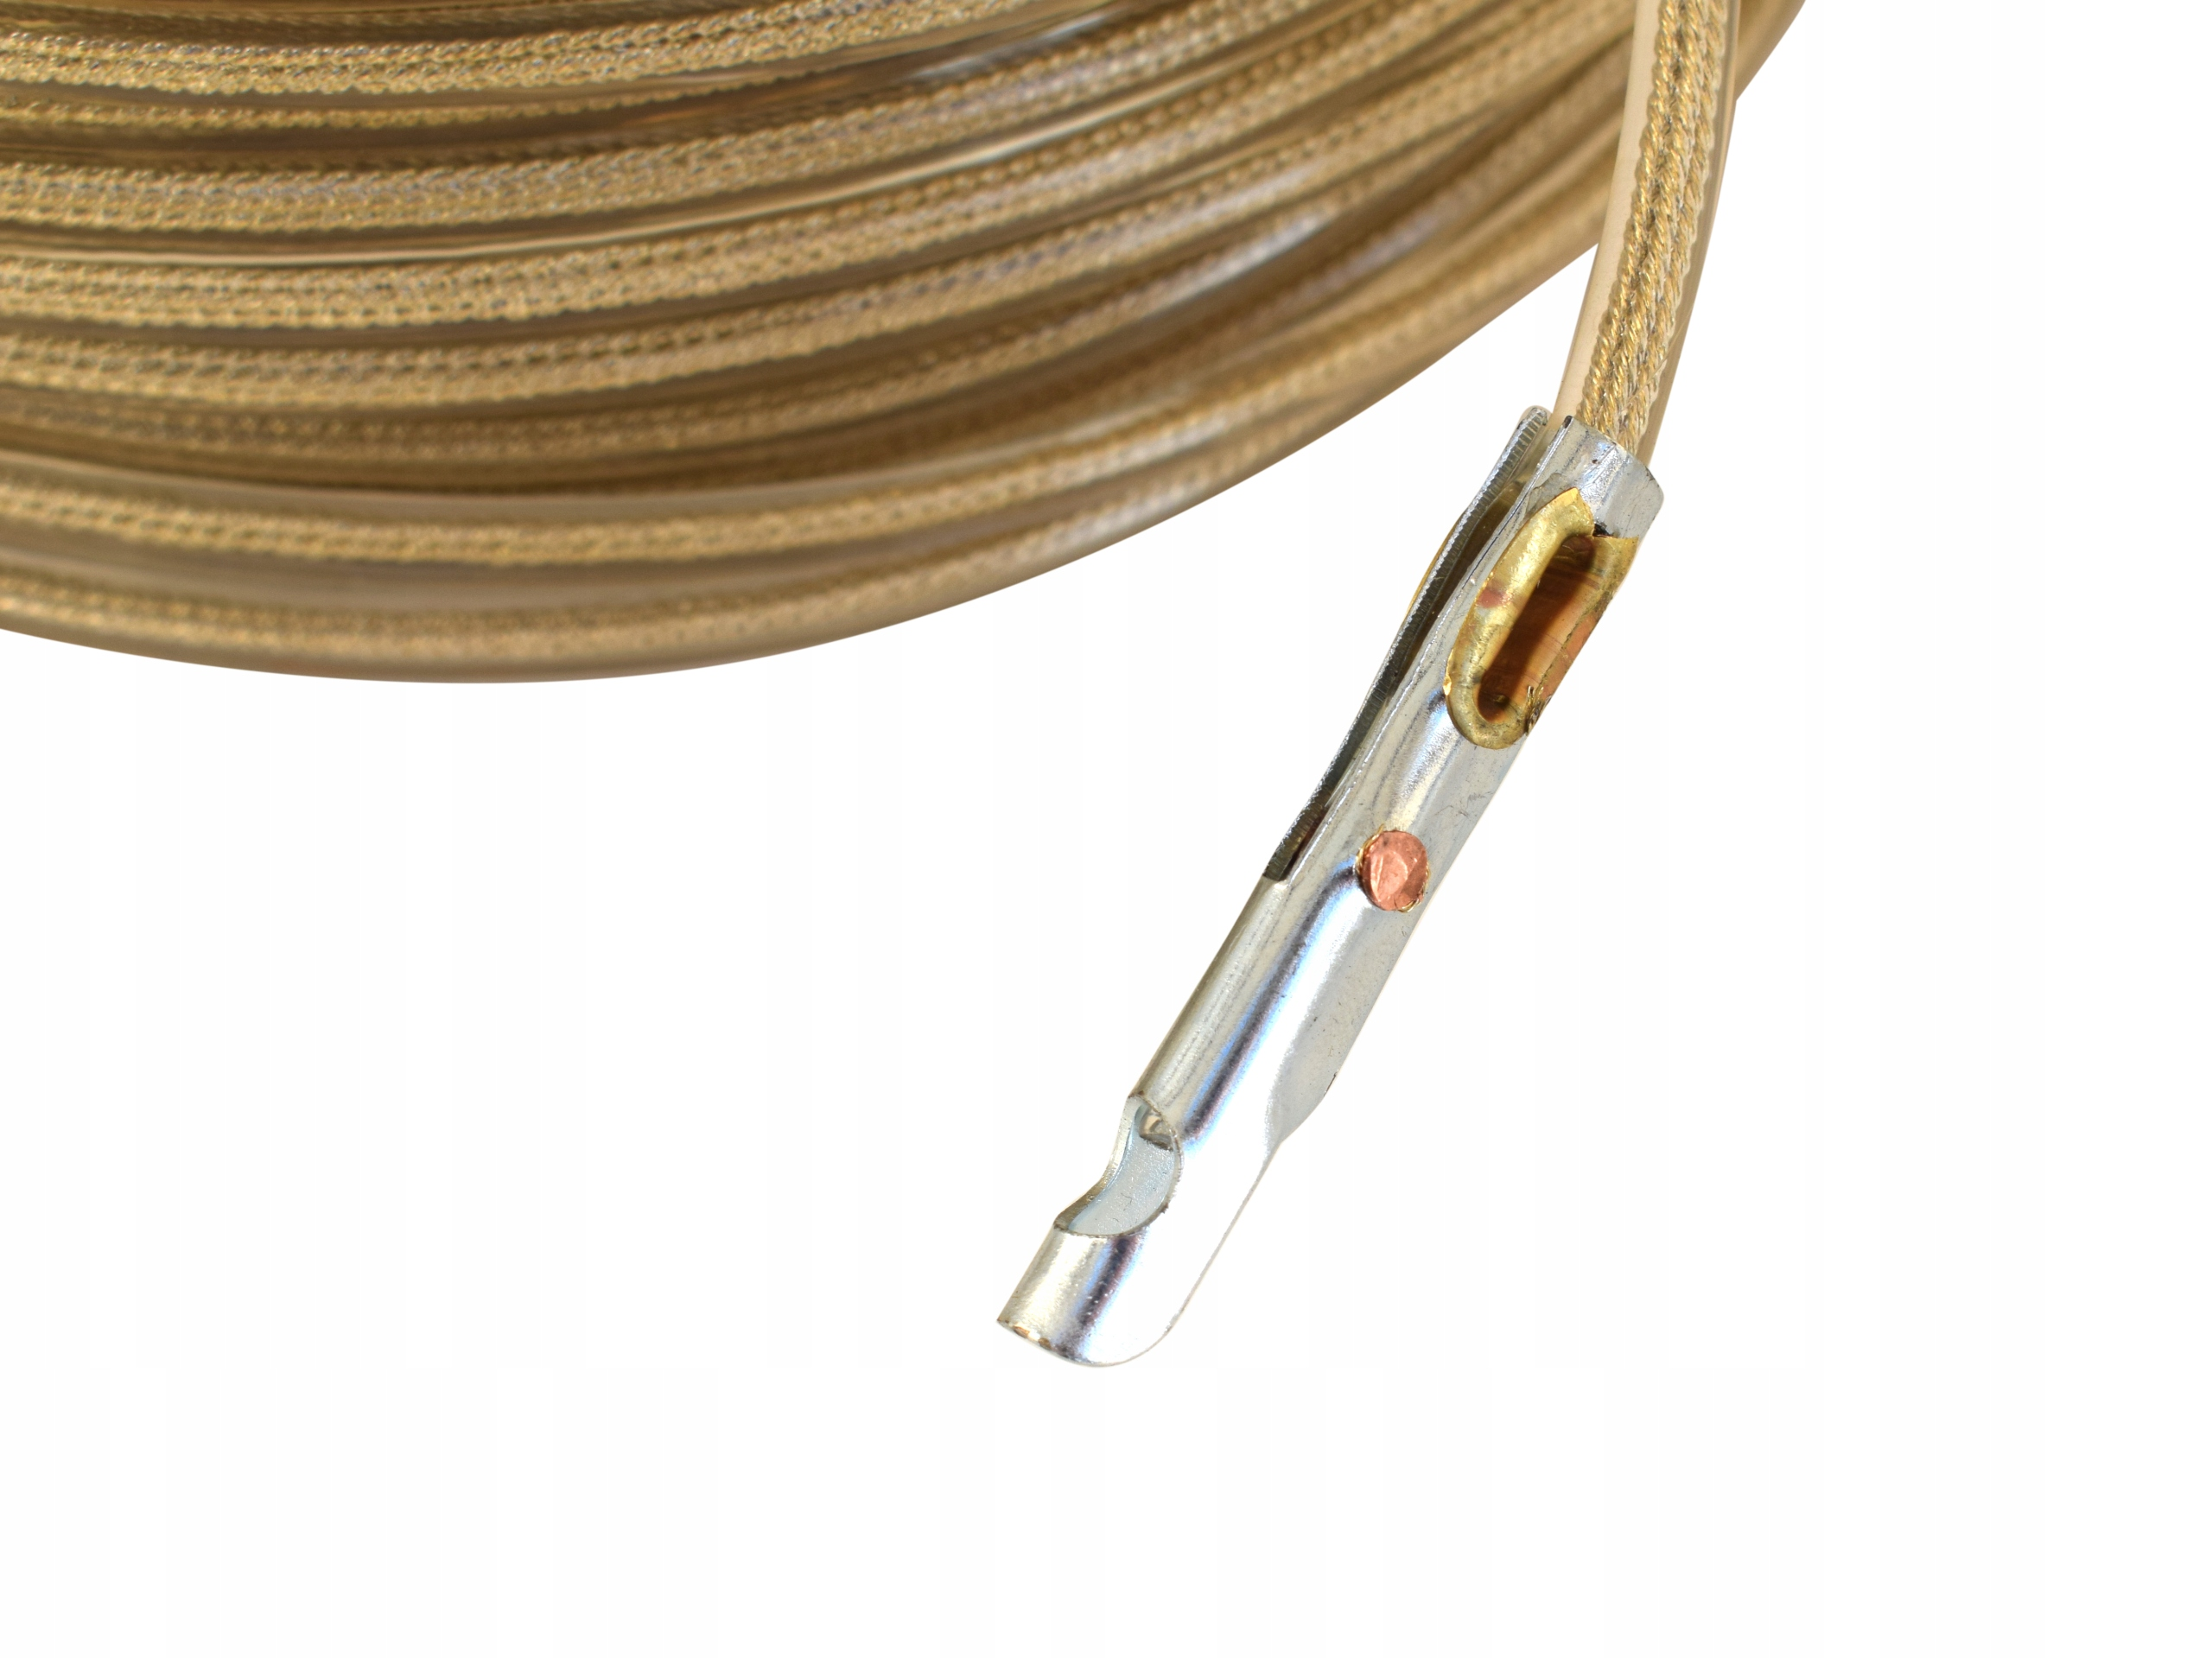 LINKA CELNA FI 6mm, L= 36mb PLANDEKA TIR NACZEPA Numer katalogowy producenta 84,65